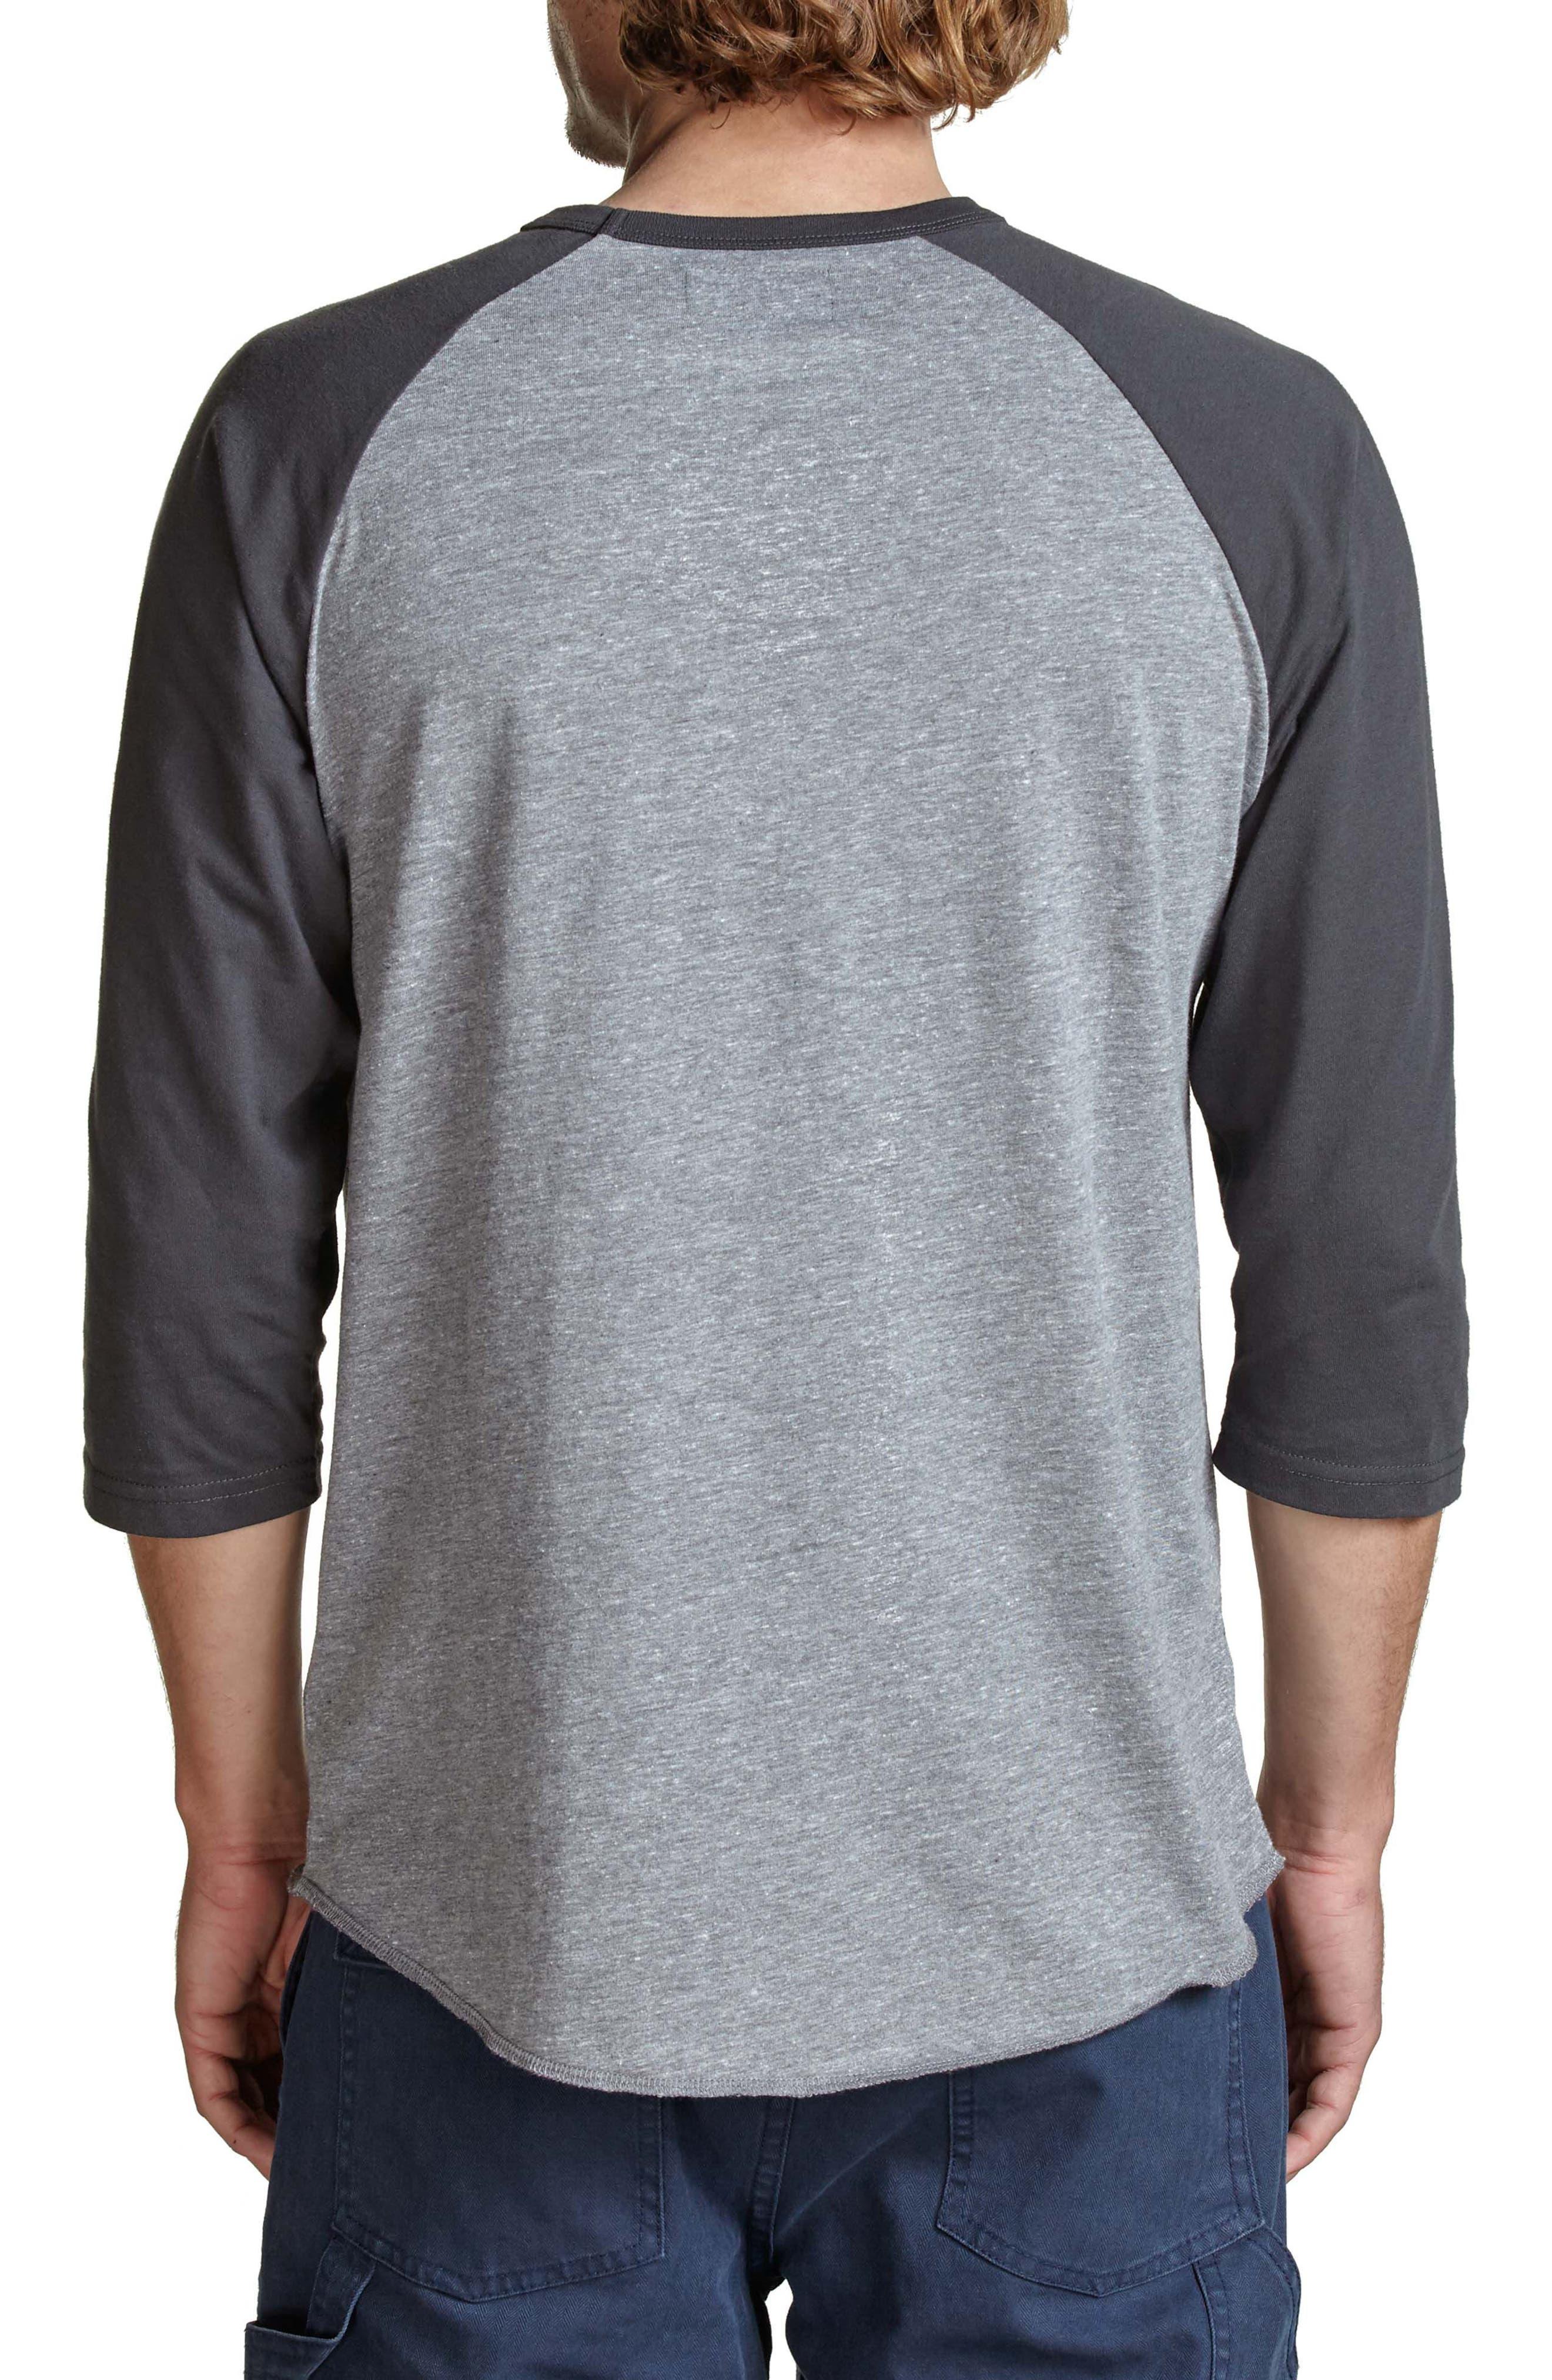 Concord Baseball T-Shirt,                             Alternate thumbnail 2, color,                             Grey/ Washed Black